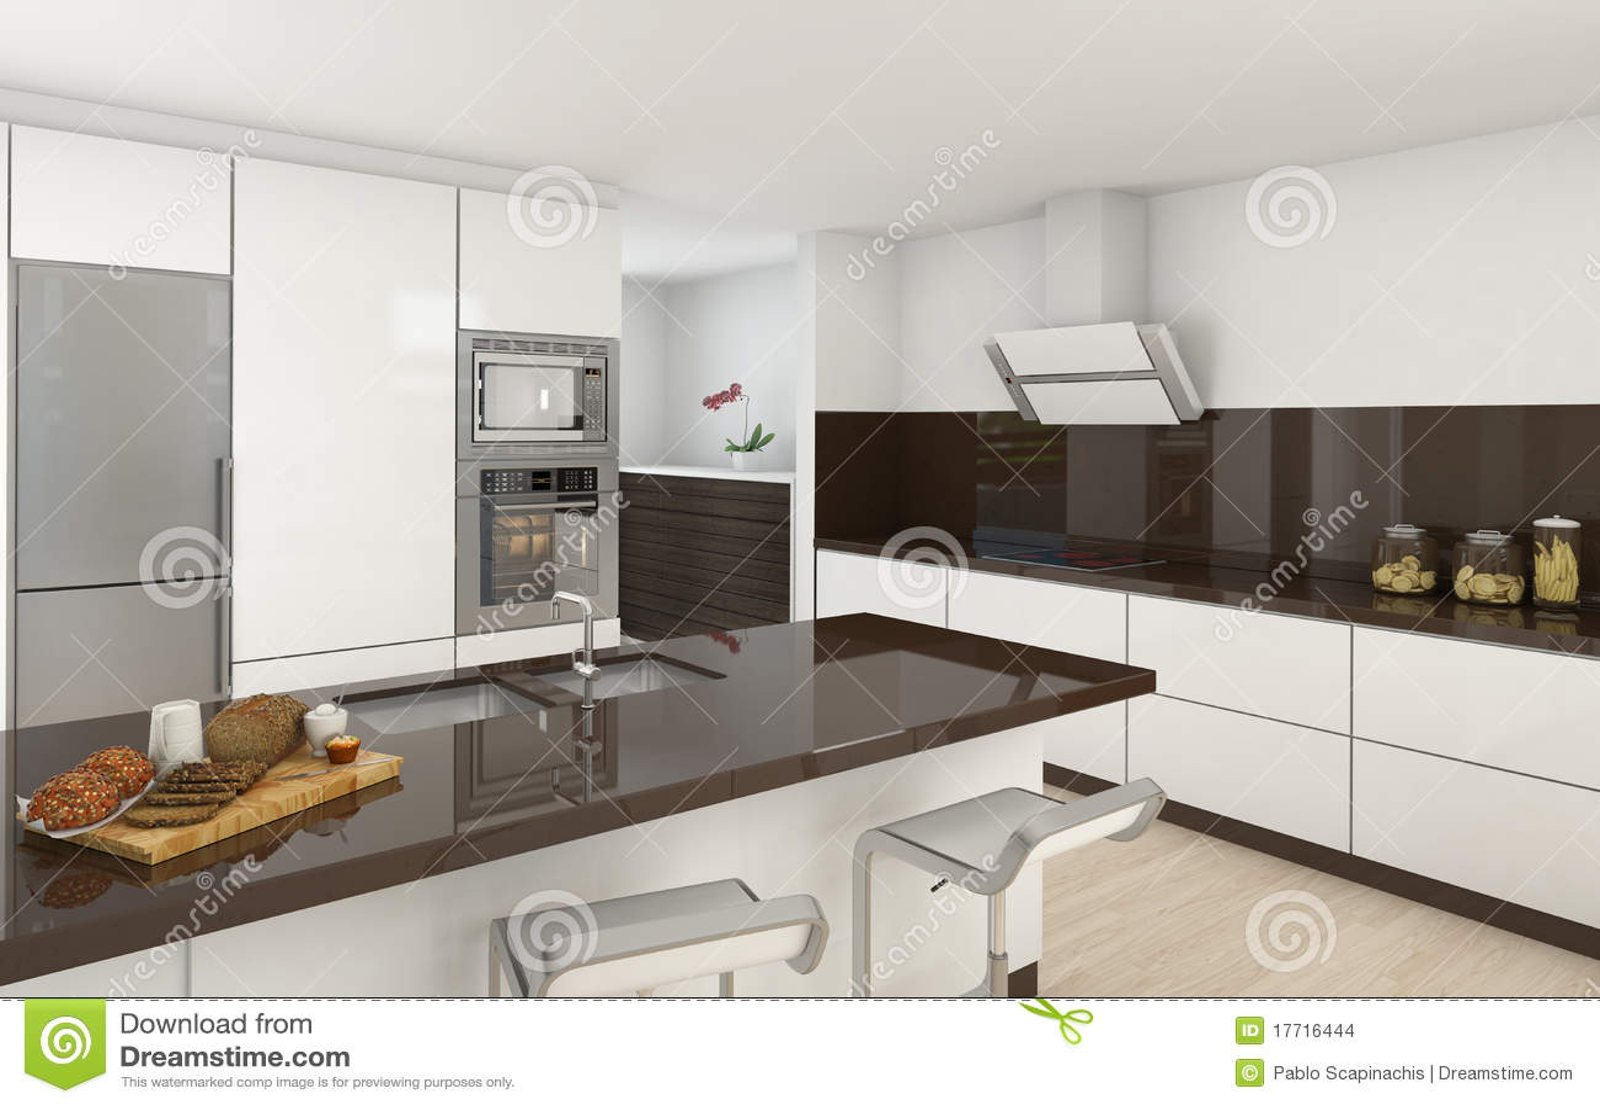 Cuisine moderne blanche et brune images stock image - Images cuisine moderne ...